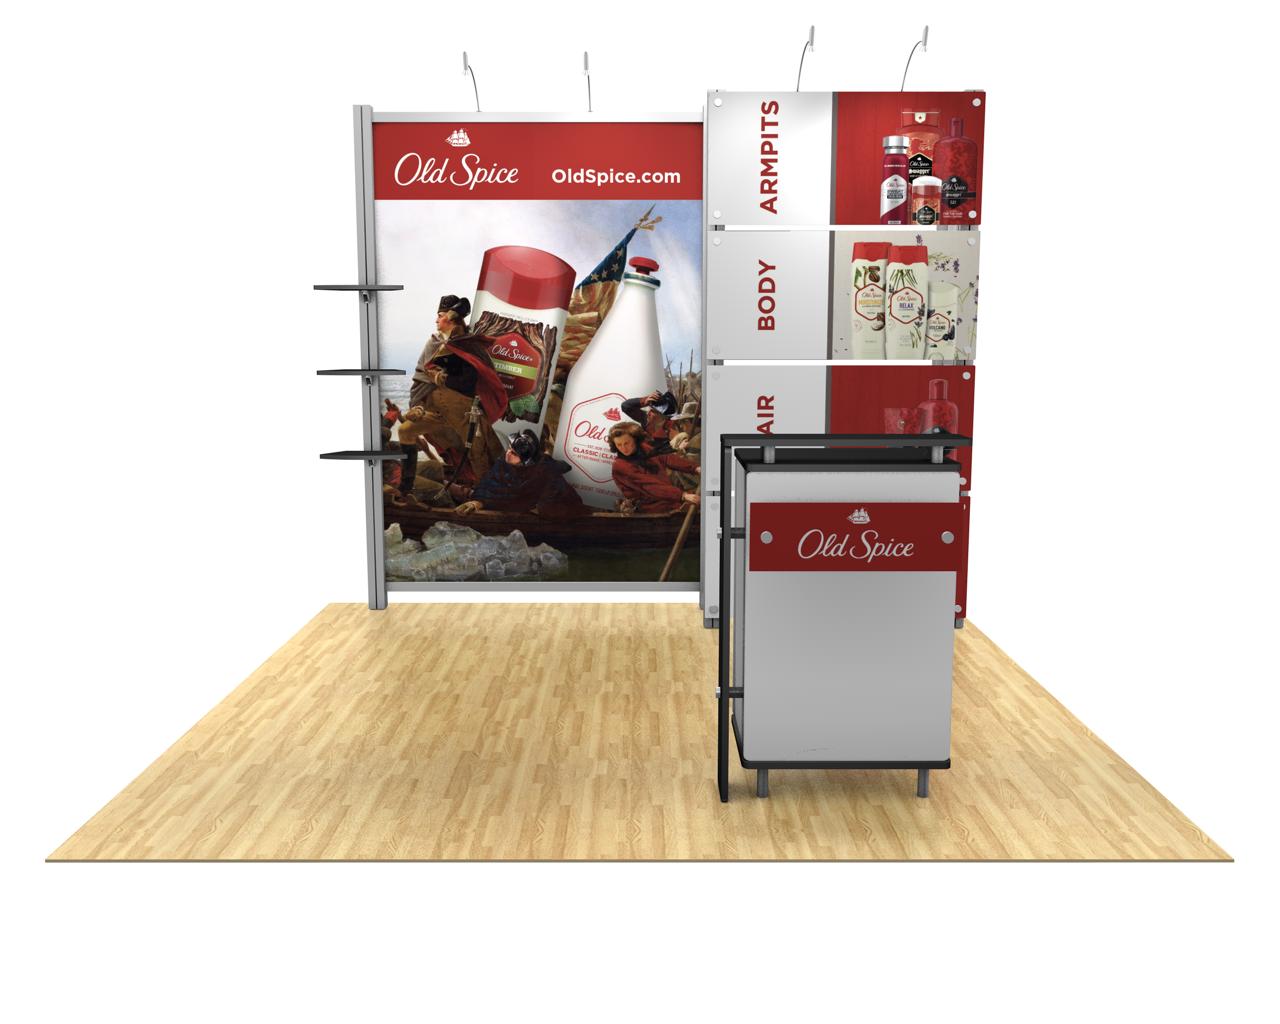 XVline Modular 10ft Trade Show Display Kit - 10.05